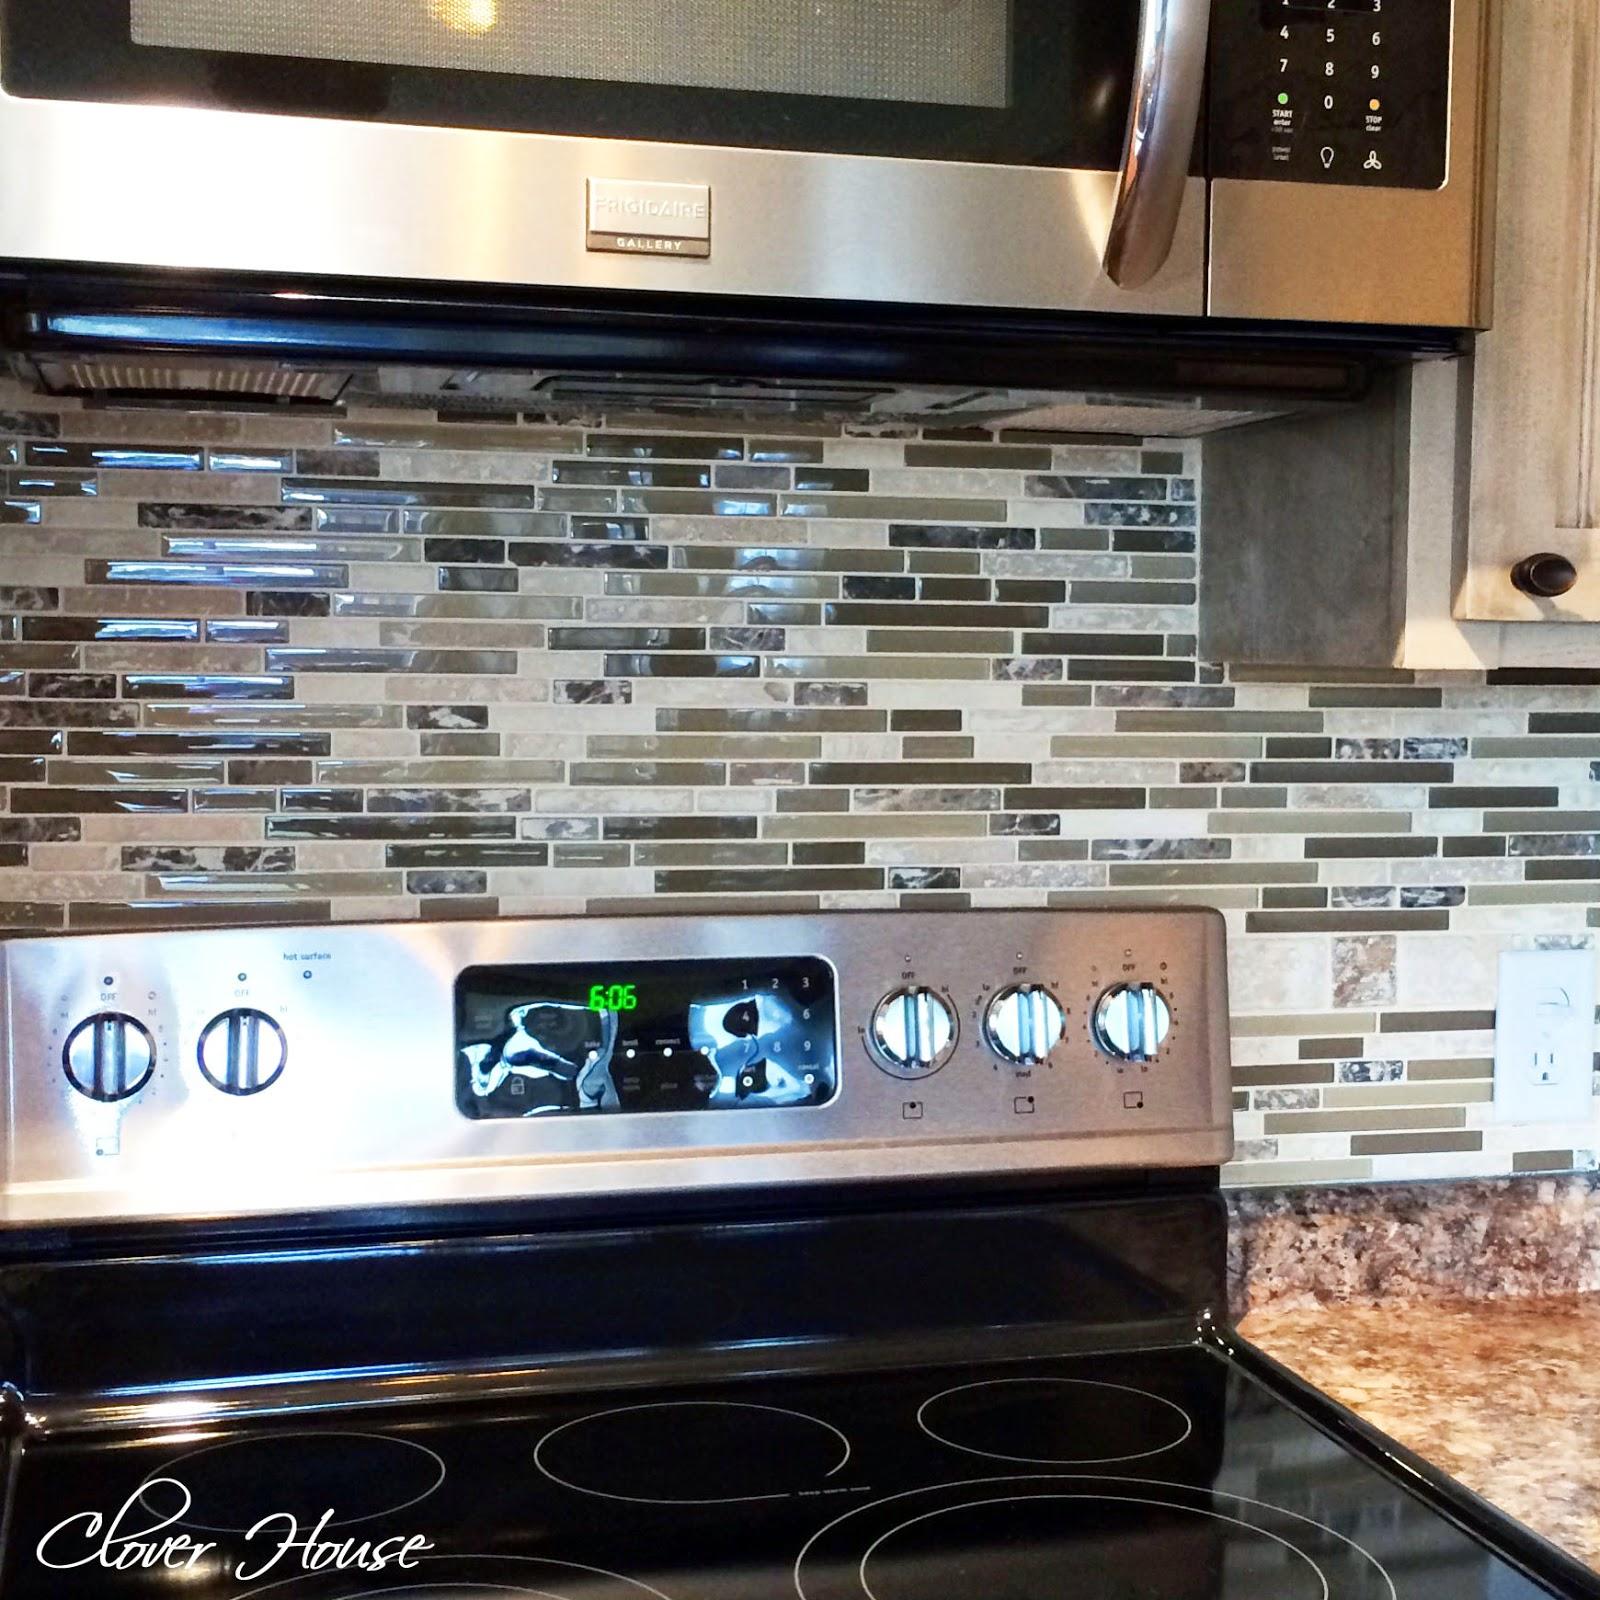 Grouting Kitchen Tiles Backsplash